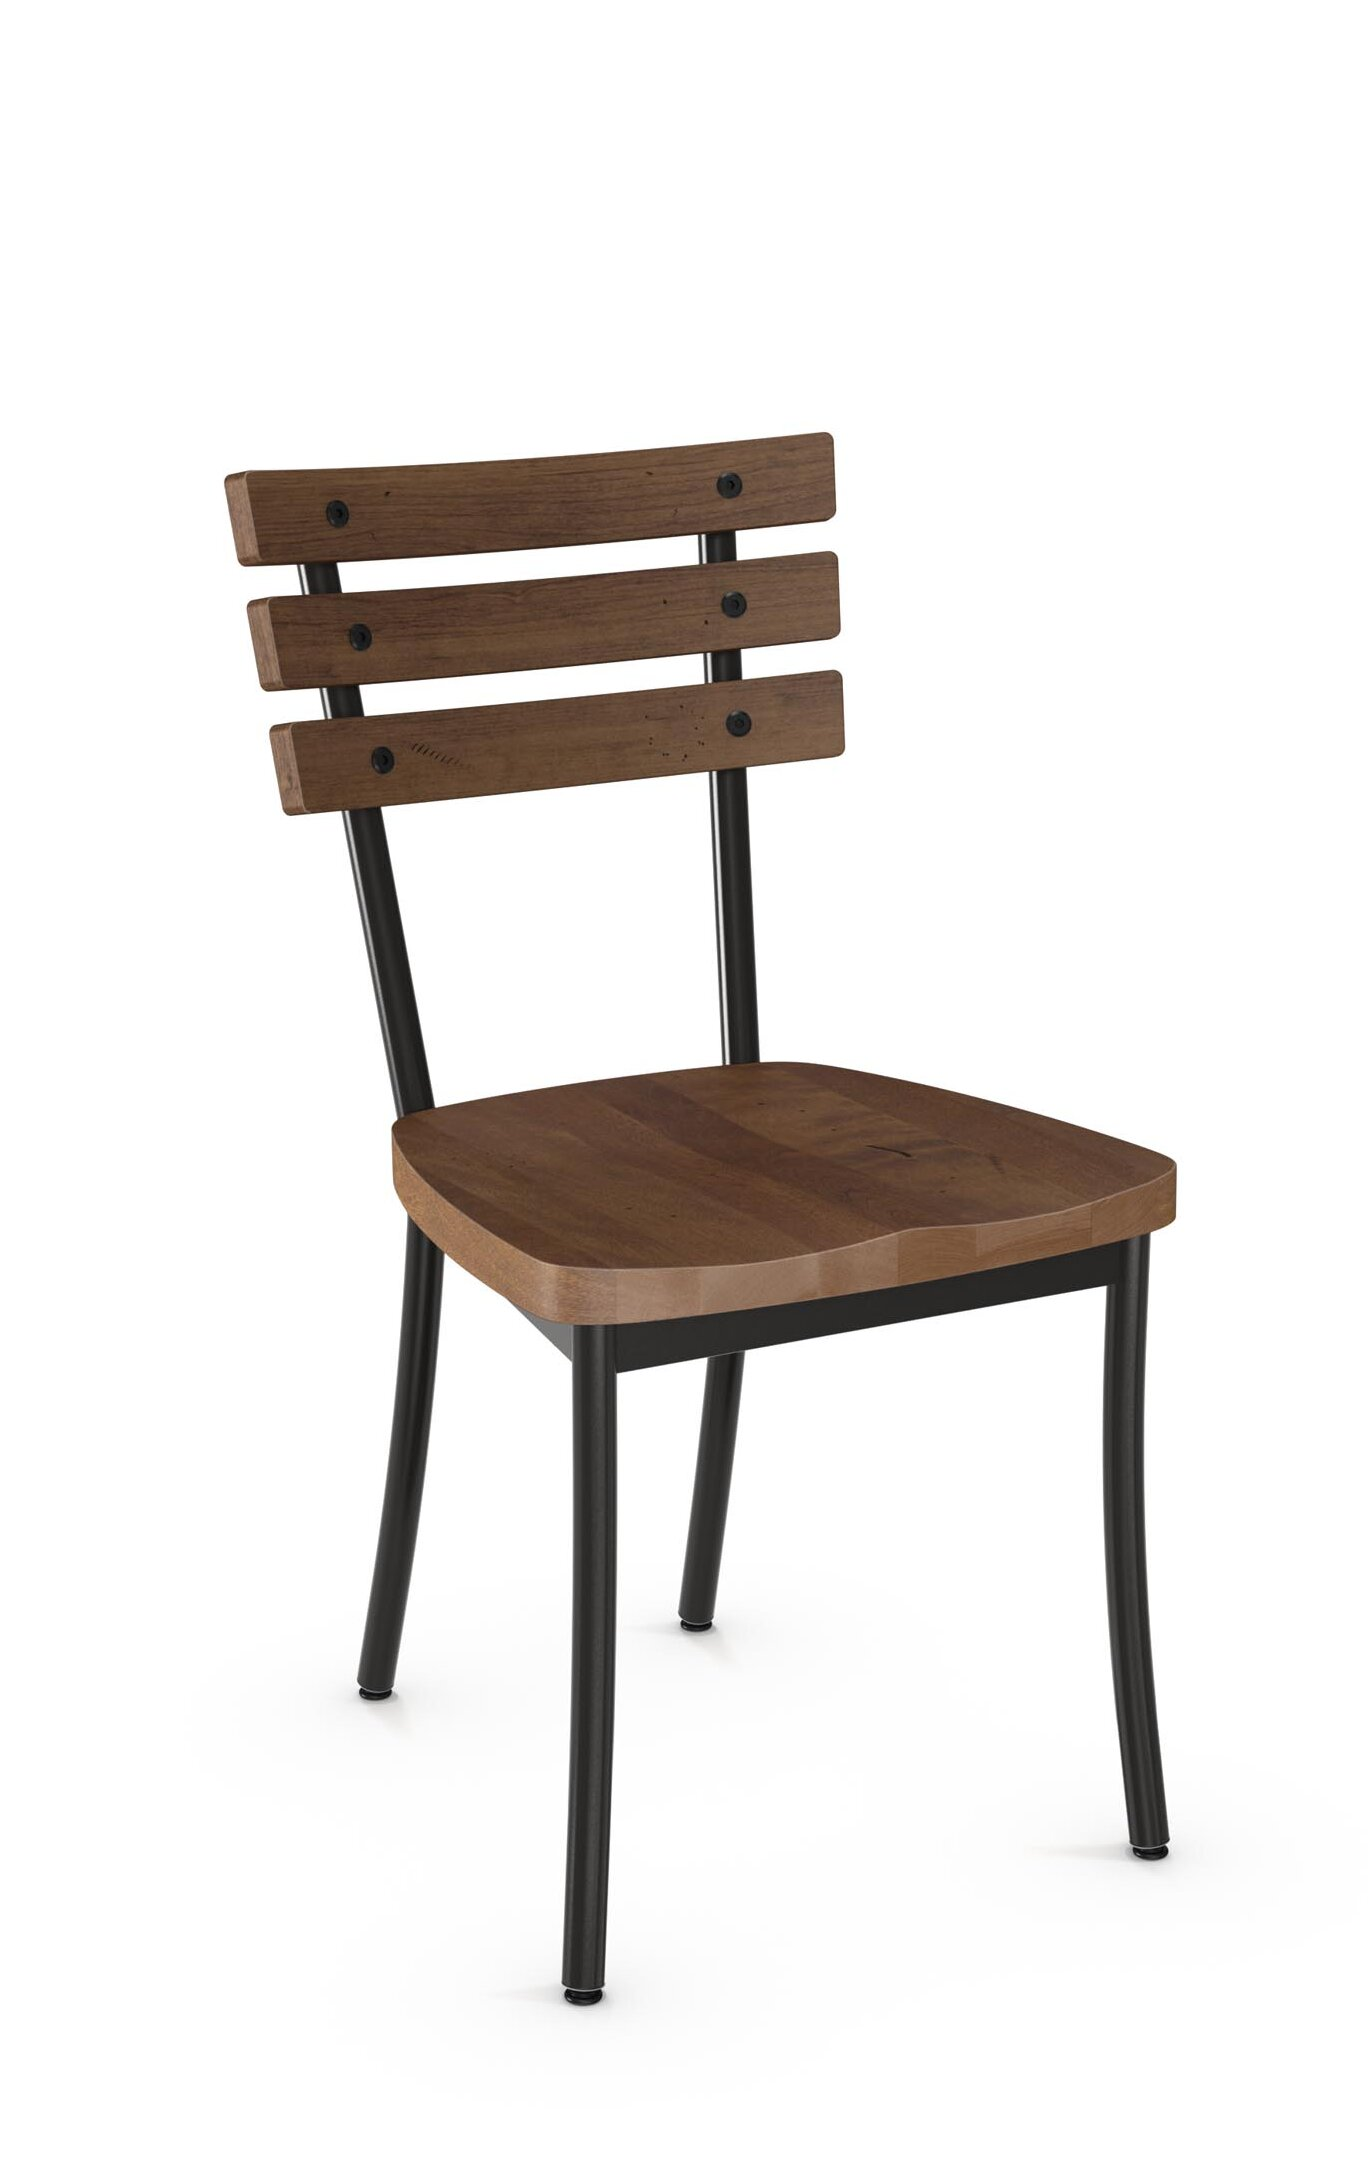 Gracie Oaks Dillard Solid Wood Dining Chair | Wayfair